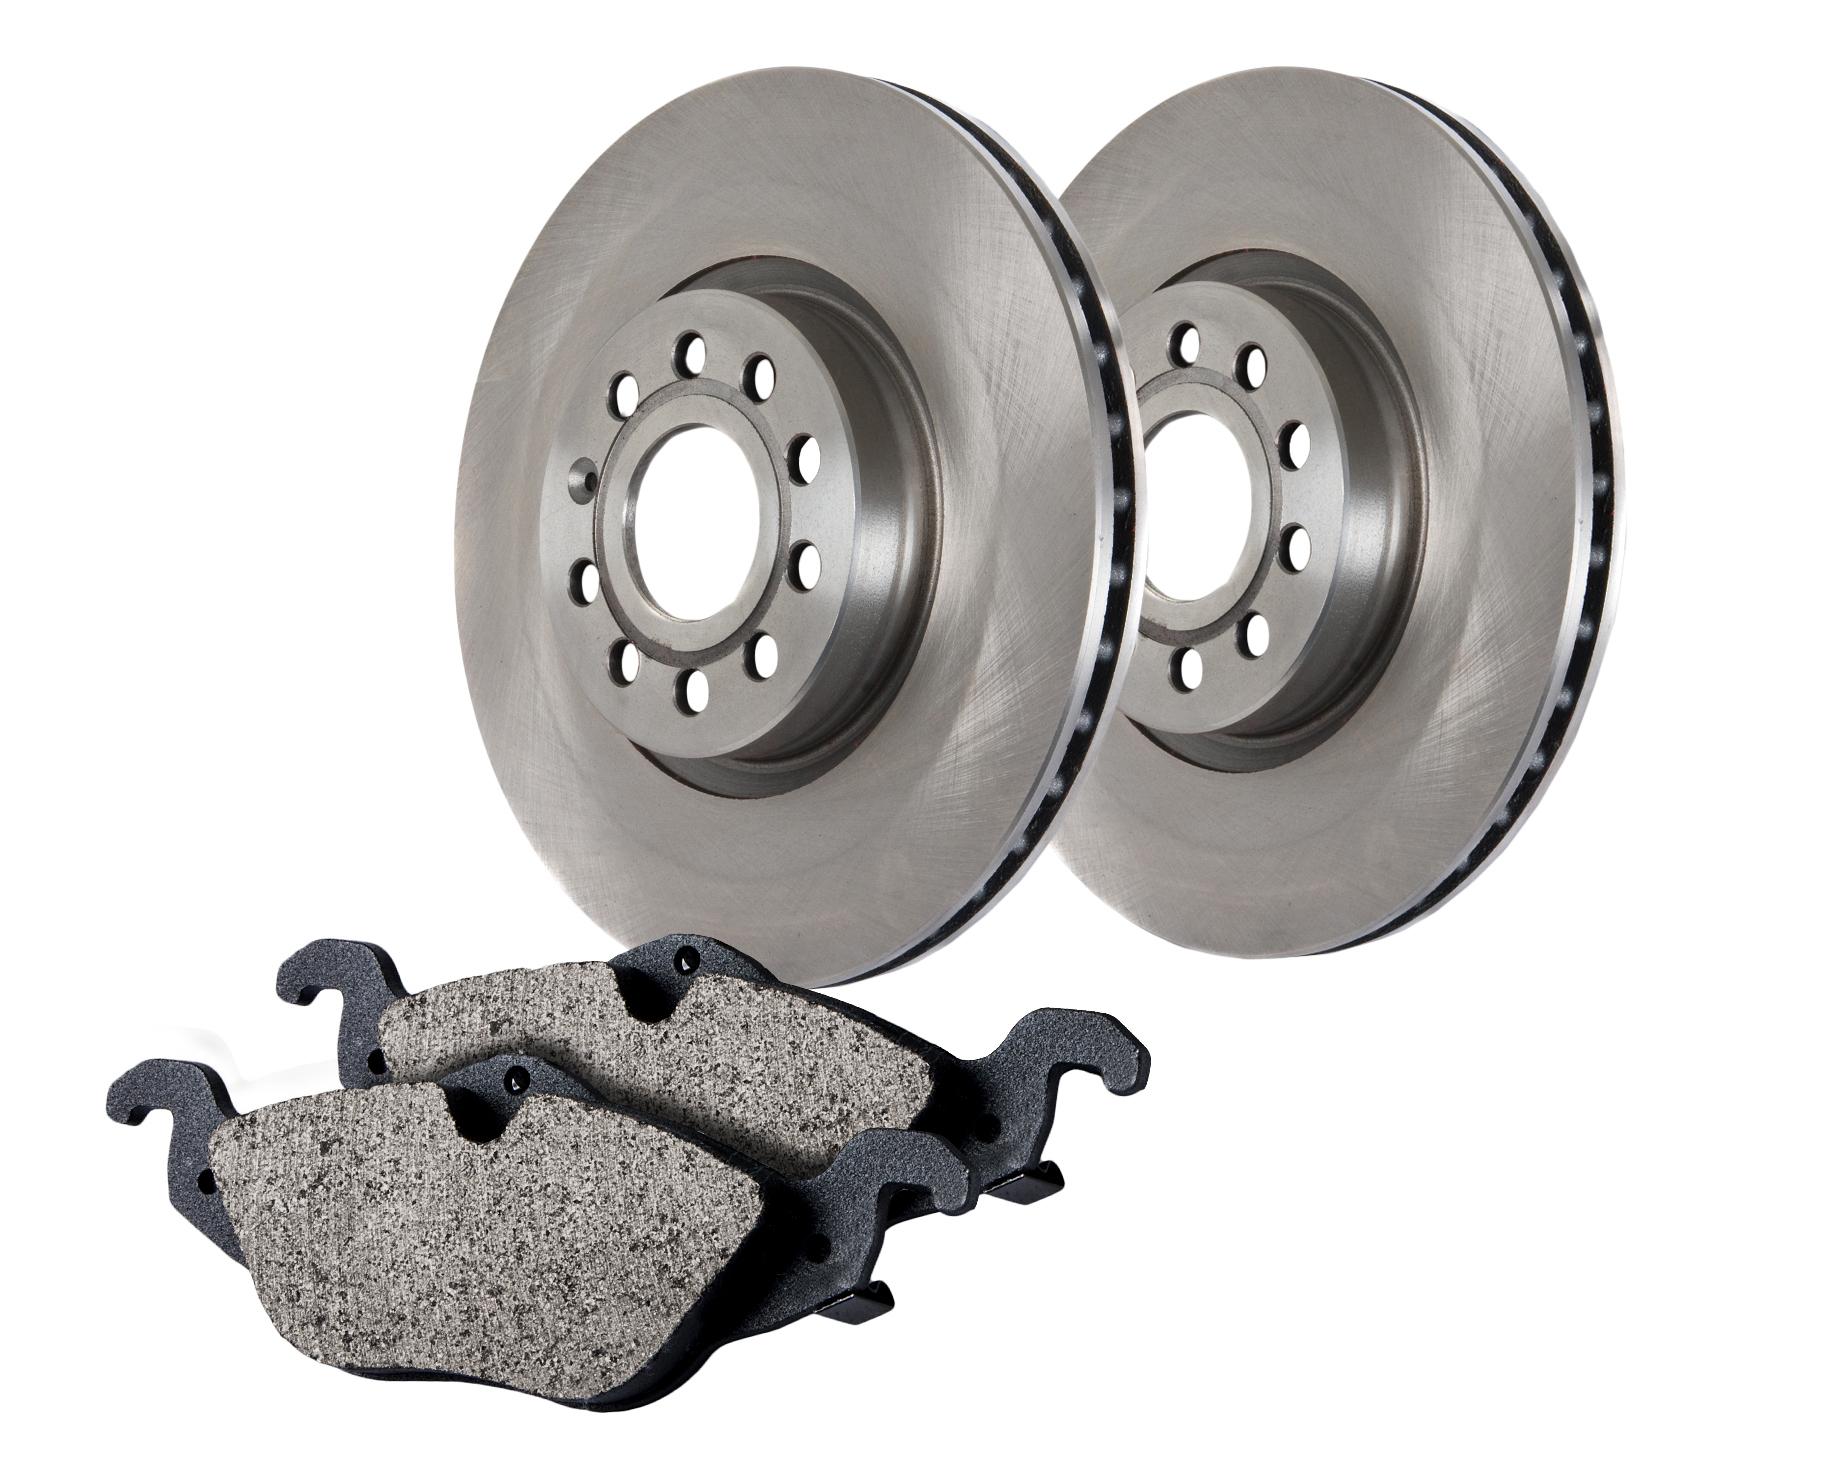 Centric Brake Parts 905.63023 Brake Rotor and Pad Kit, Premium, Semi-Metallic Pads, Iron, Natural, Dodge Nitro 2007-11 / Jeep Liberty 2008-12, Kit